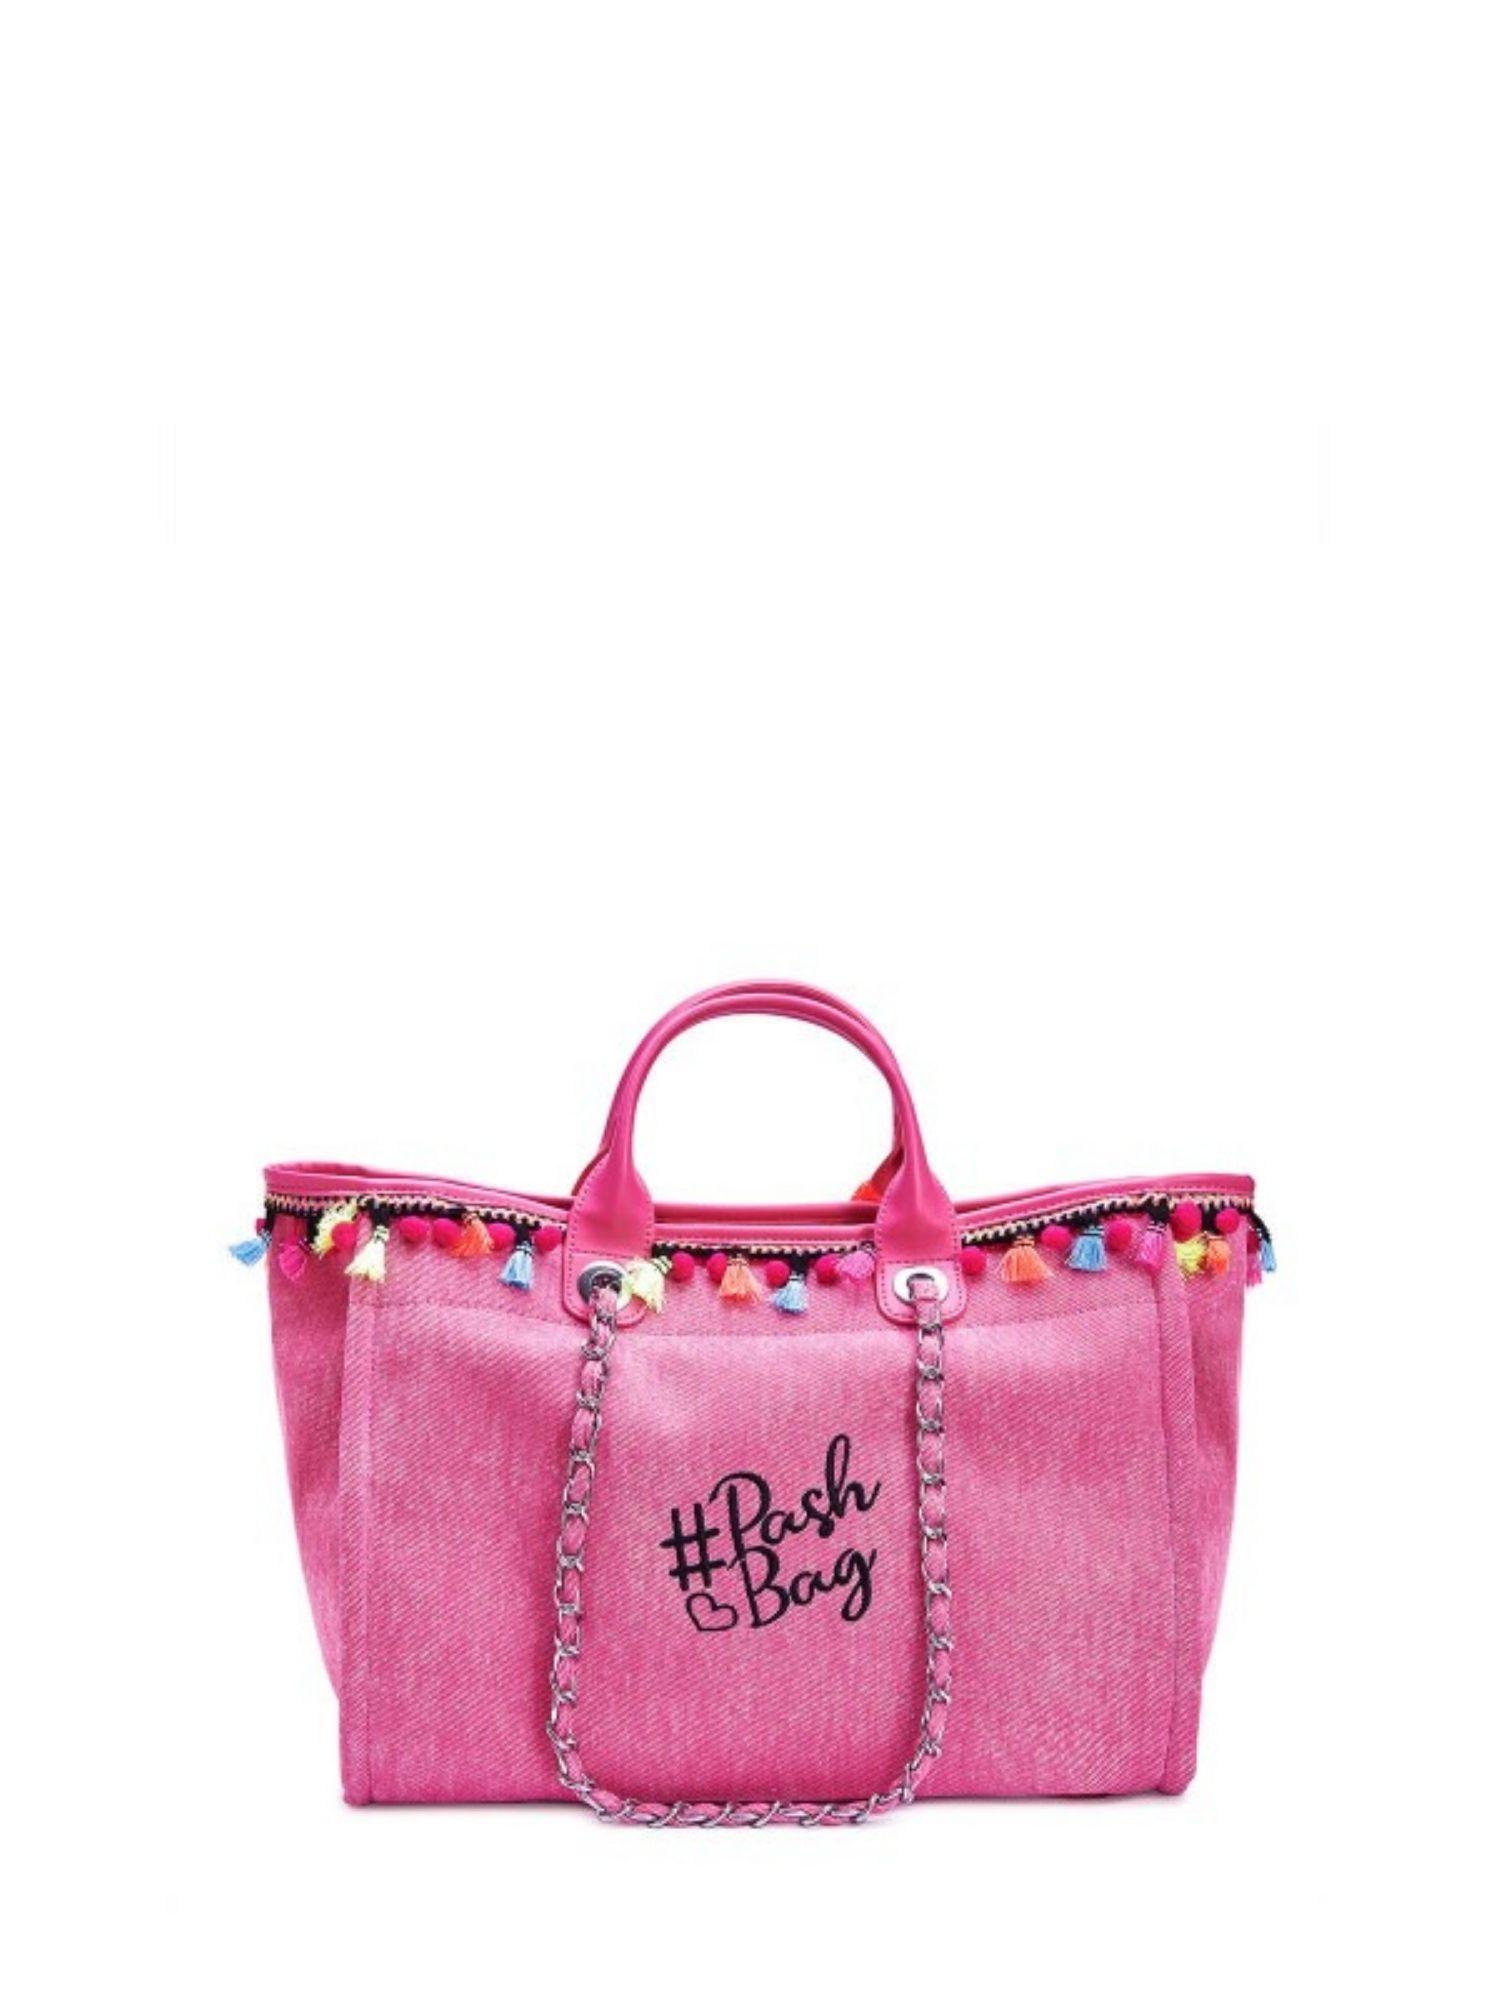 Borsa Atelier Du Sac Pash Bag 9801 Rosa